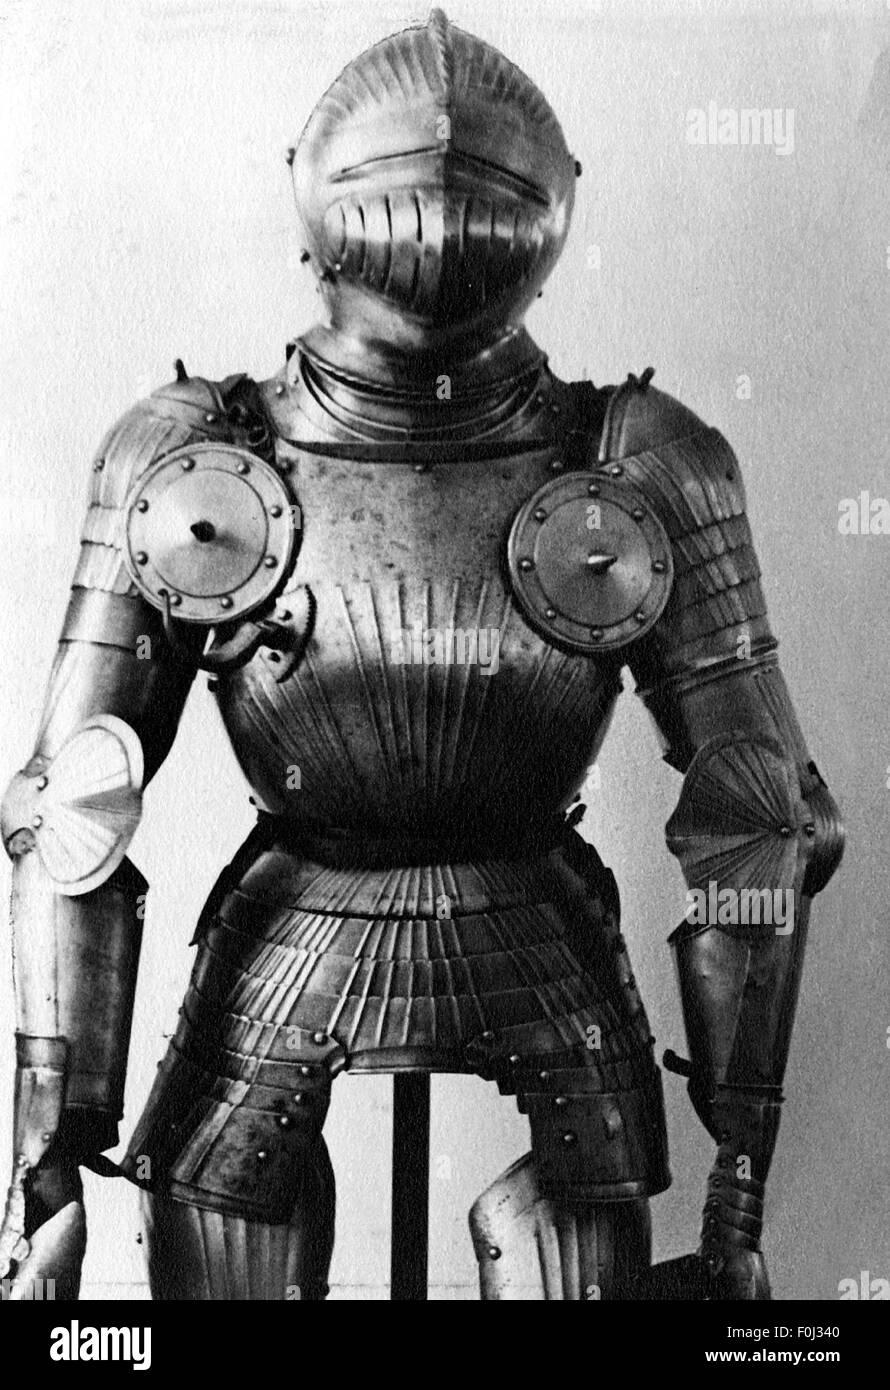 Militär, Mittelalter, Ritter Rüstung, historischen, historischen, mittelalterlichen Zeiten, Kabelbaum, Stockbild